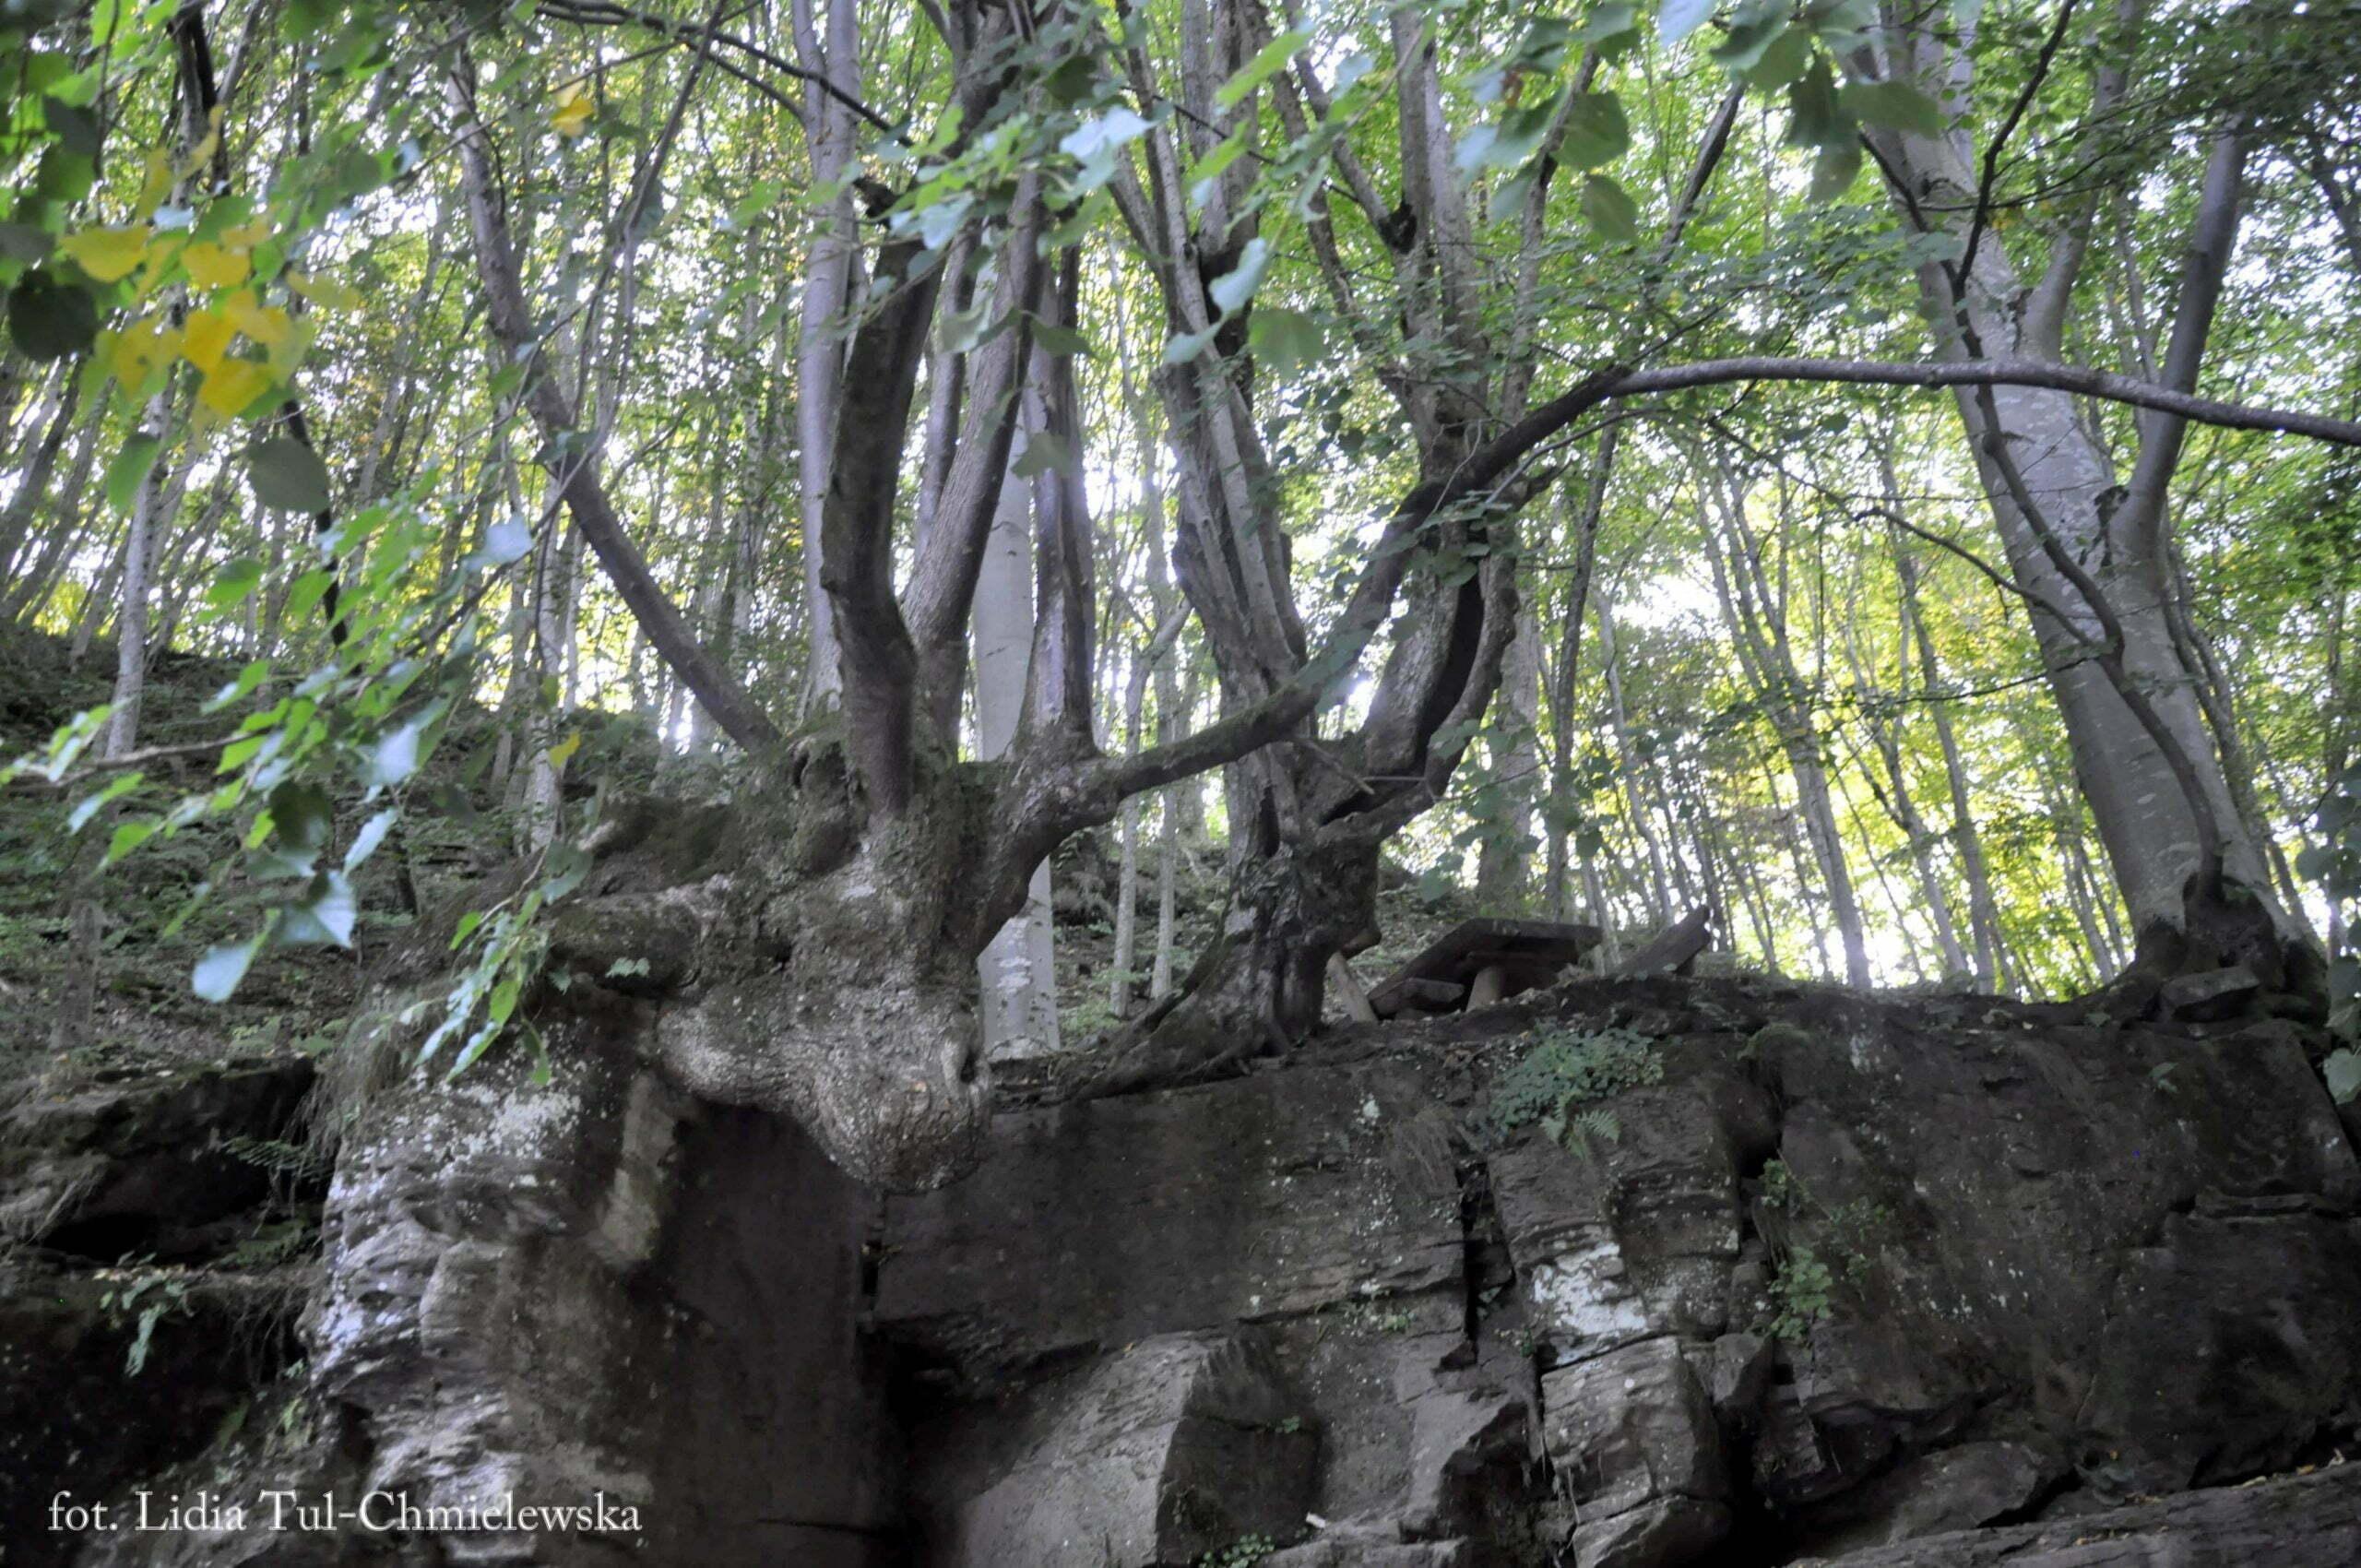 Naturalny pomnik łosia / fot. Lidia Tul-Chmielewska